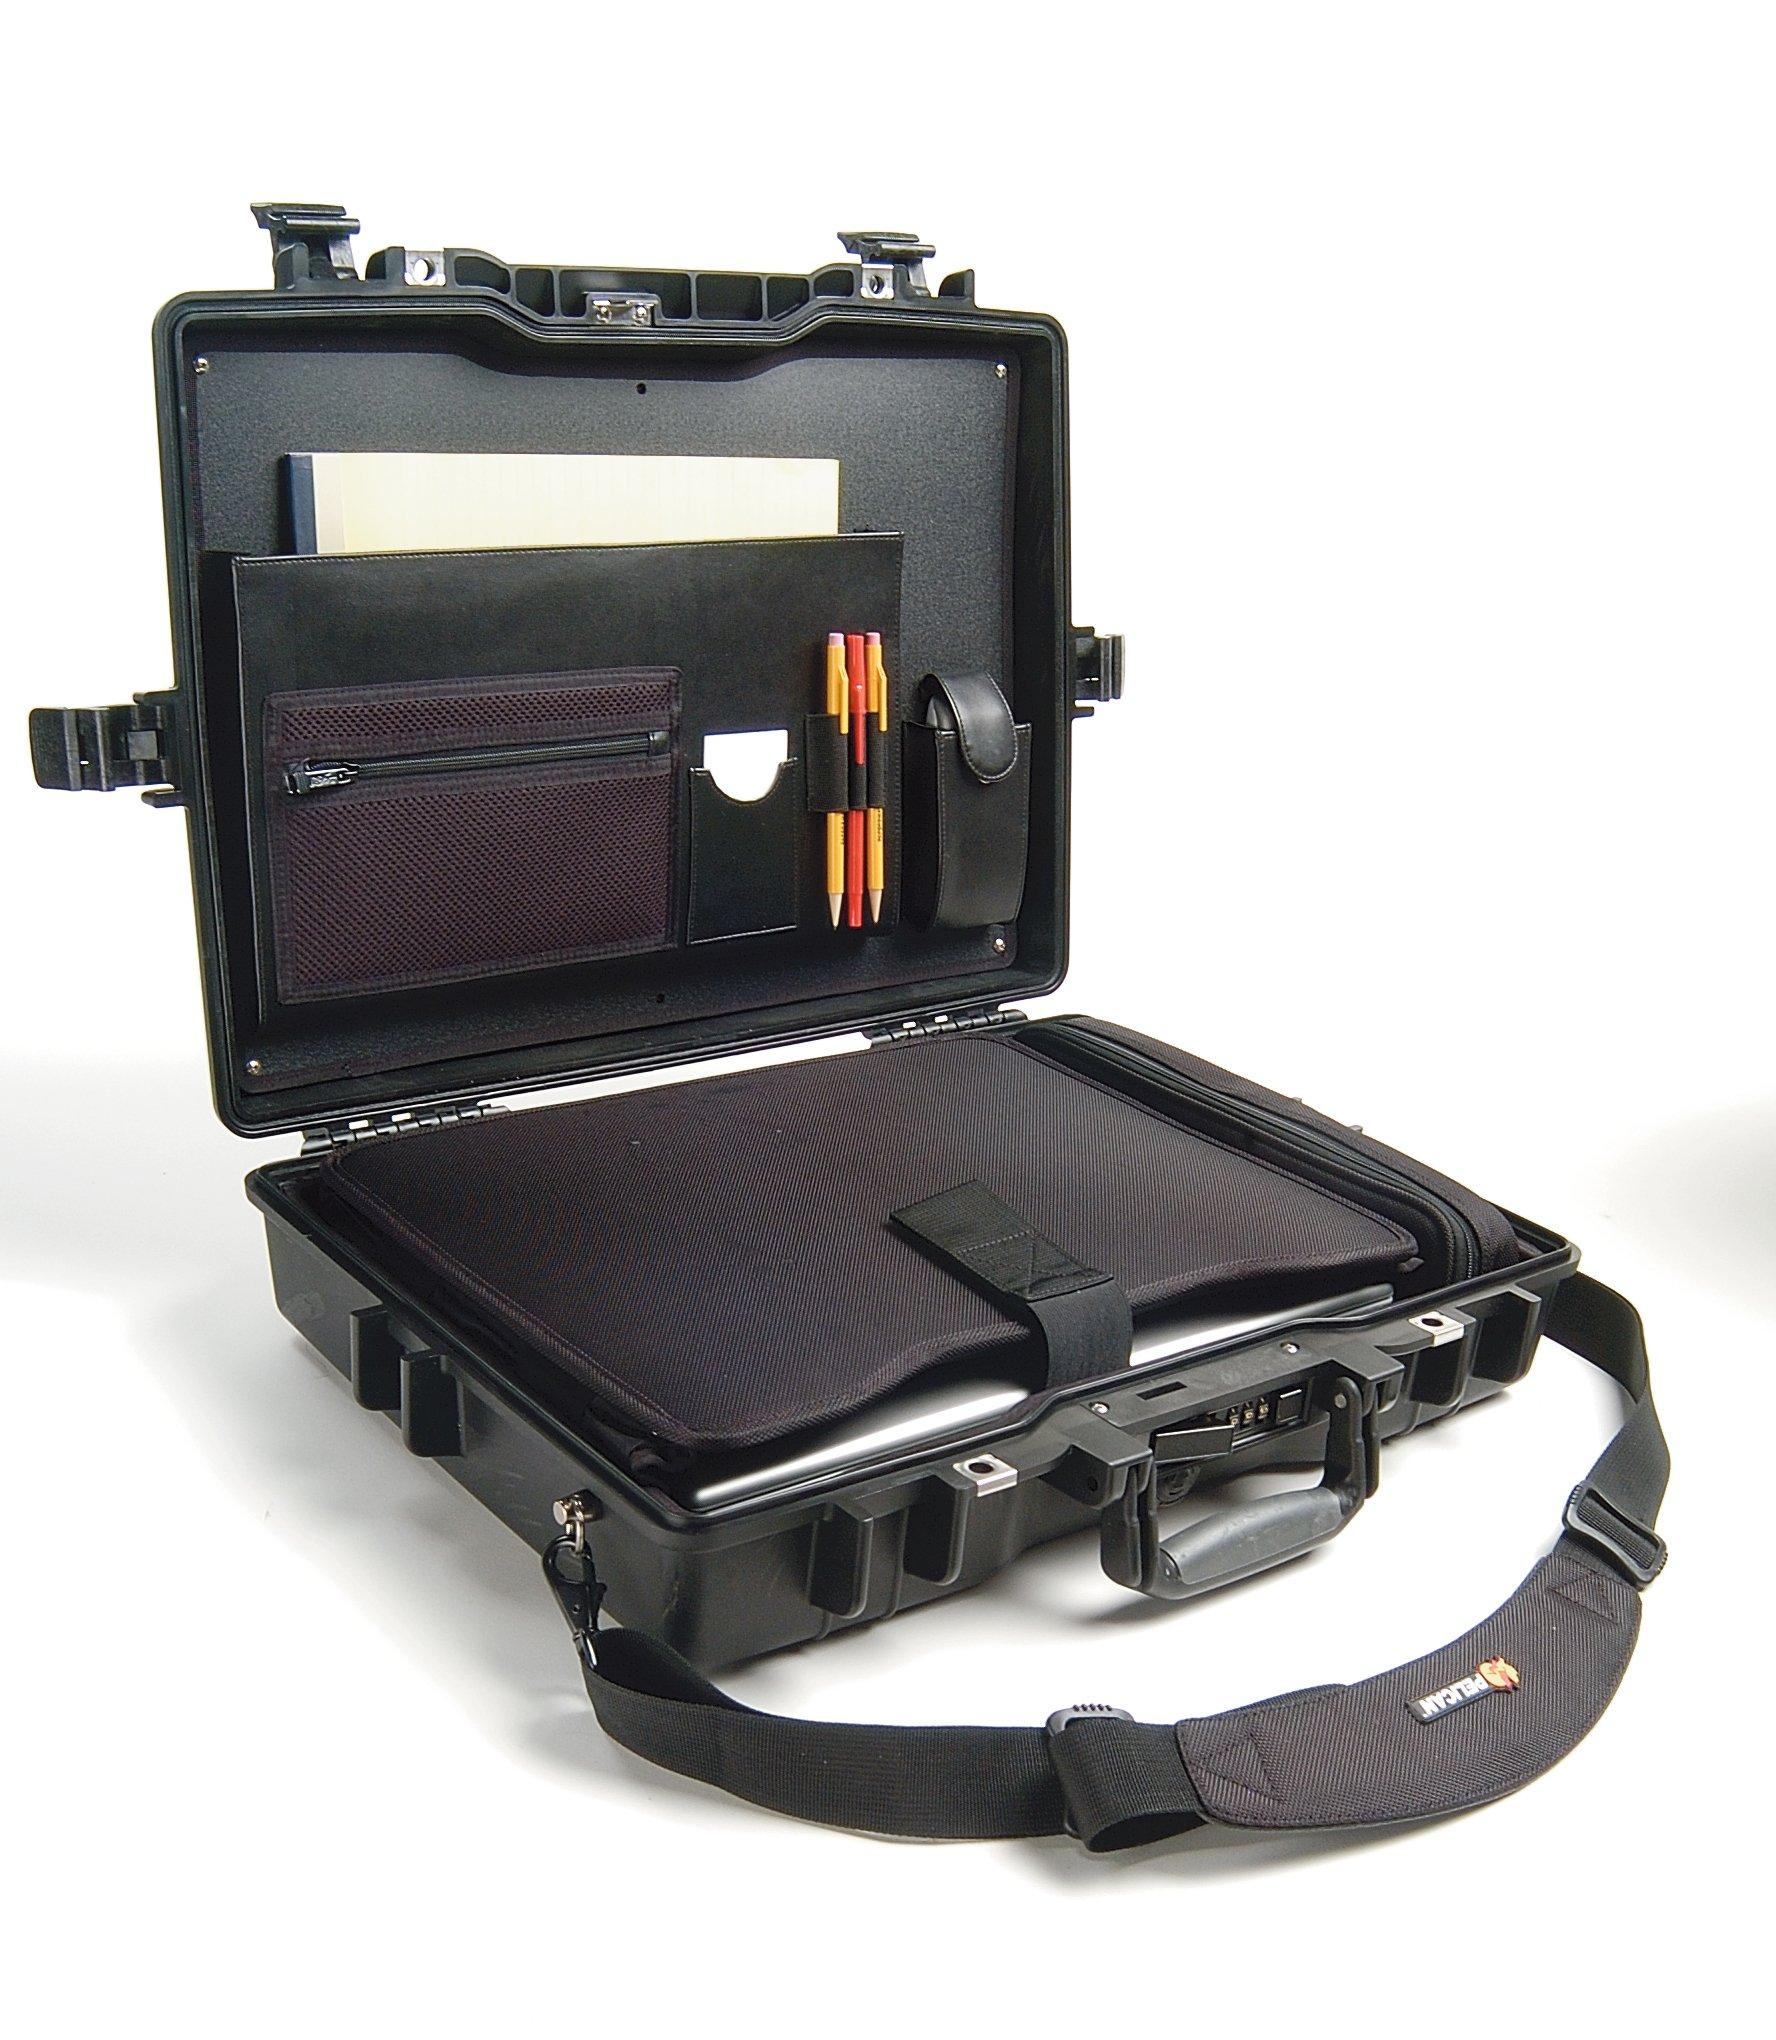 PELICAN 1495 CC#1 Deluxe Computer Case by Pelican (Image #2)